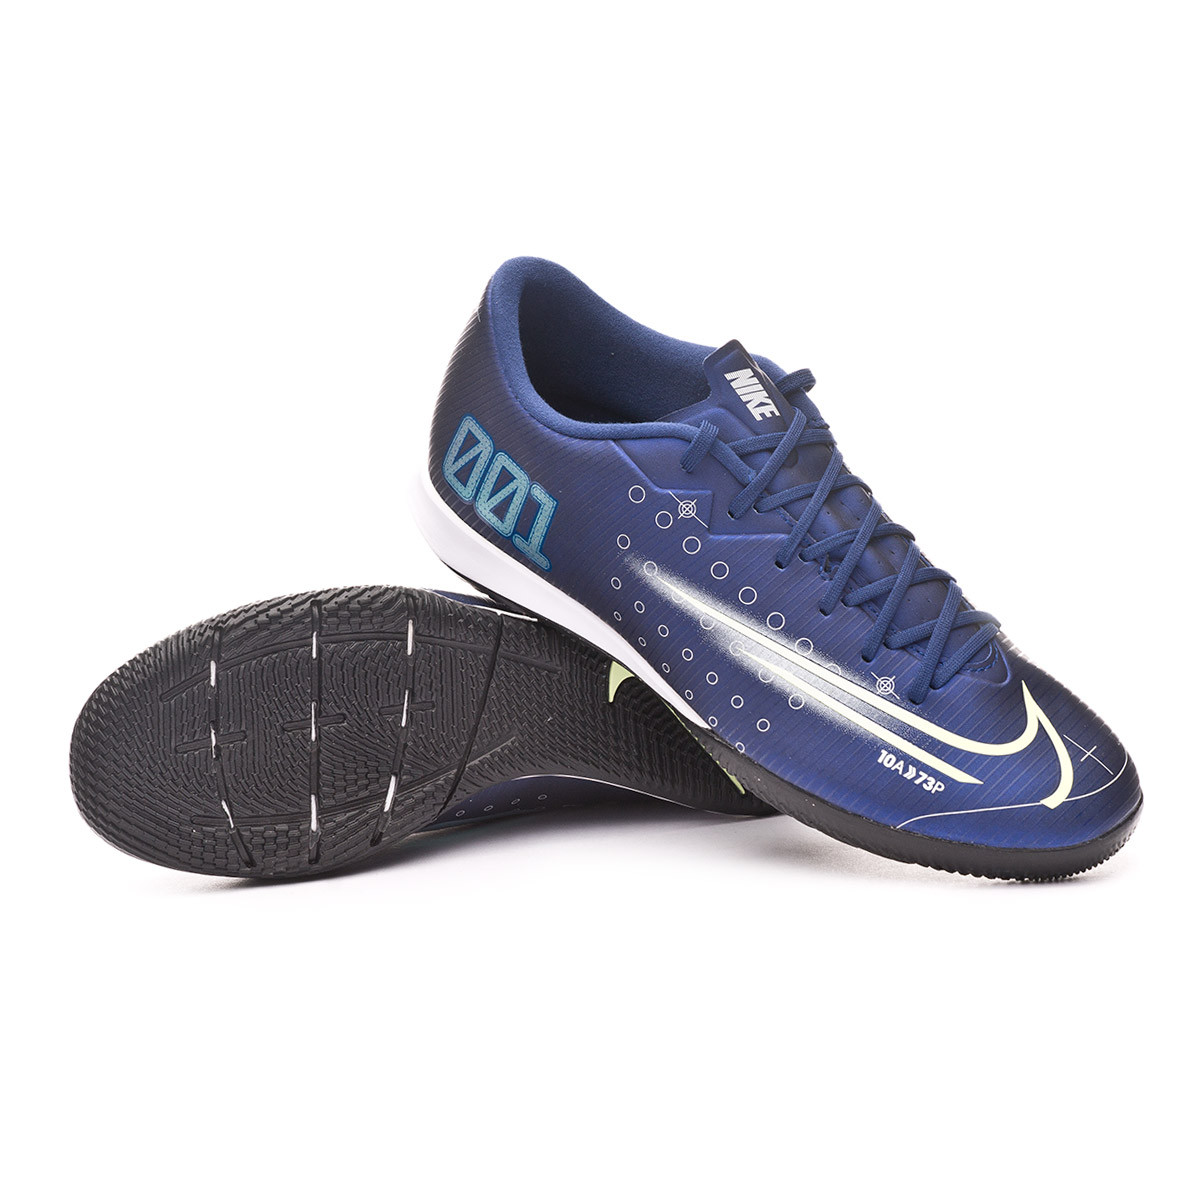 Chuteira Futsal Nike Mercurial Vapor 13 Academy MDS IC